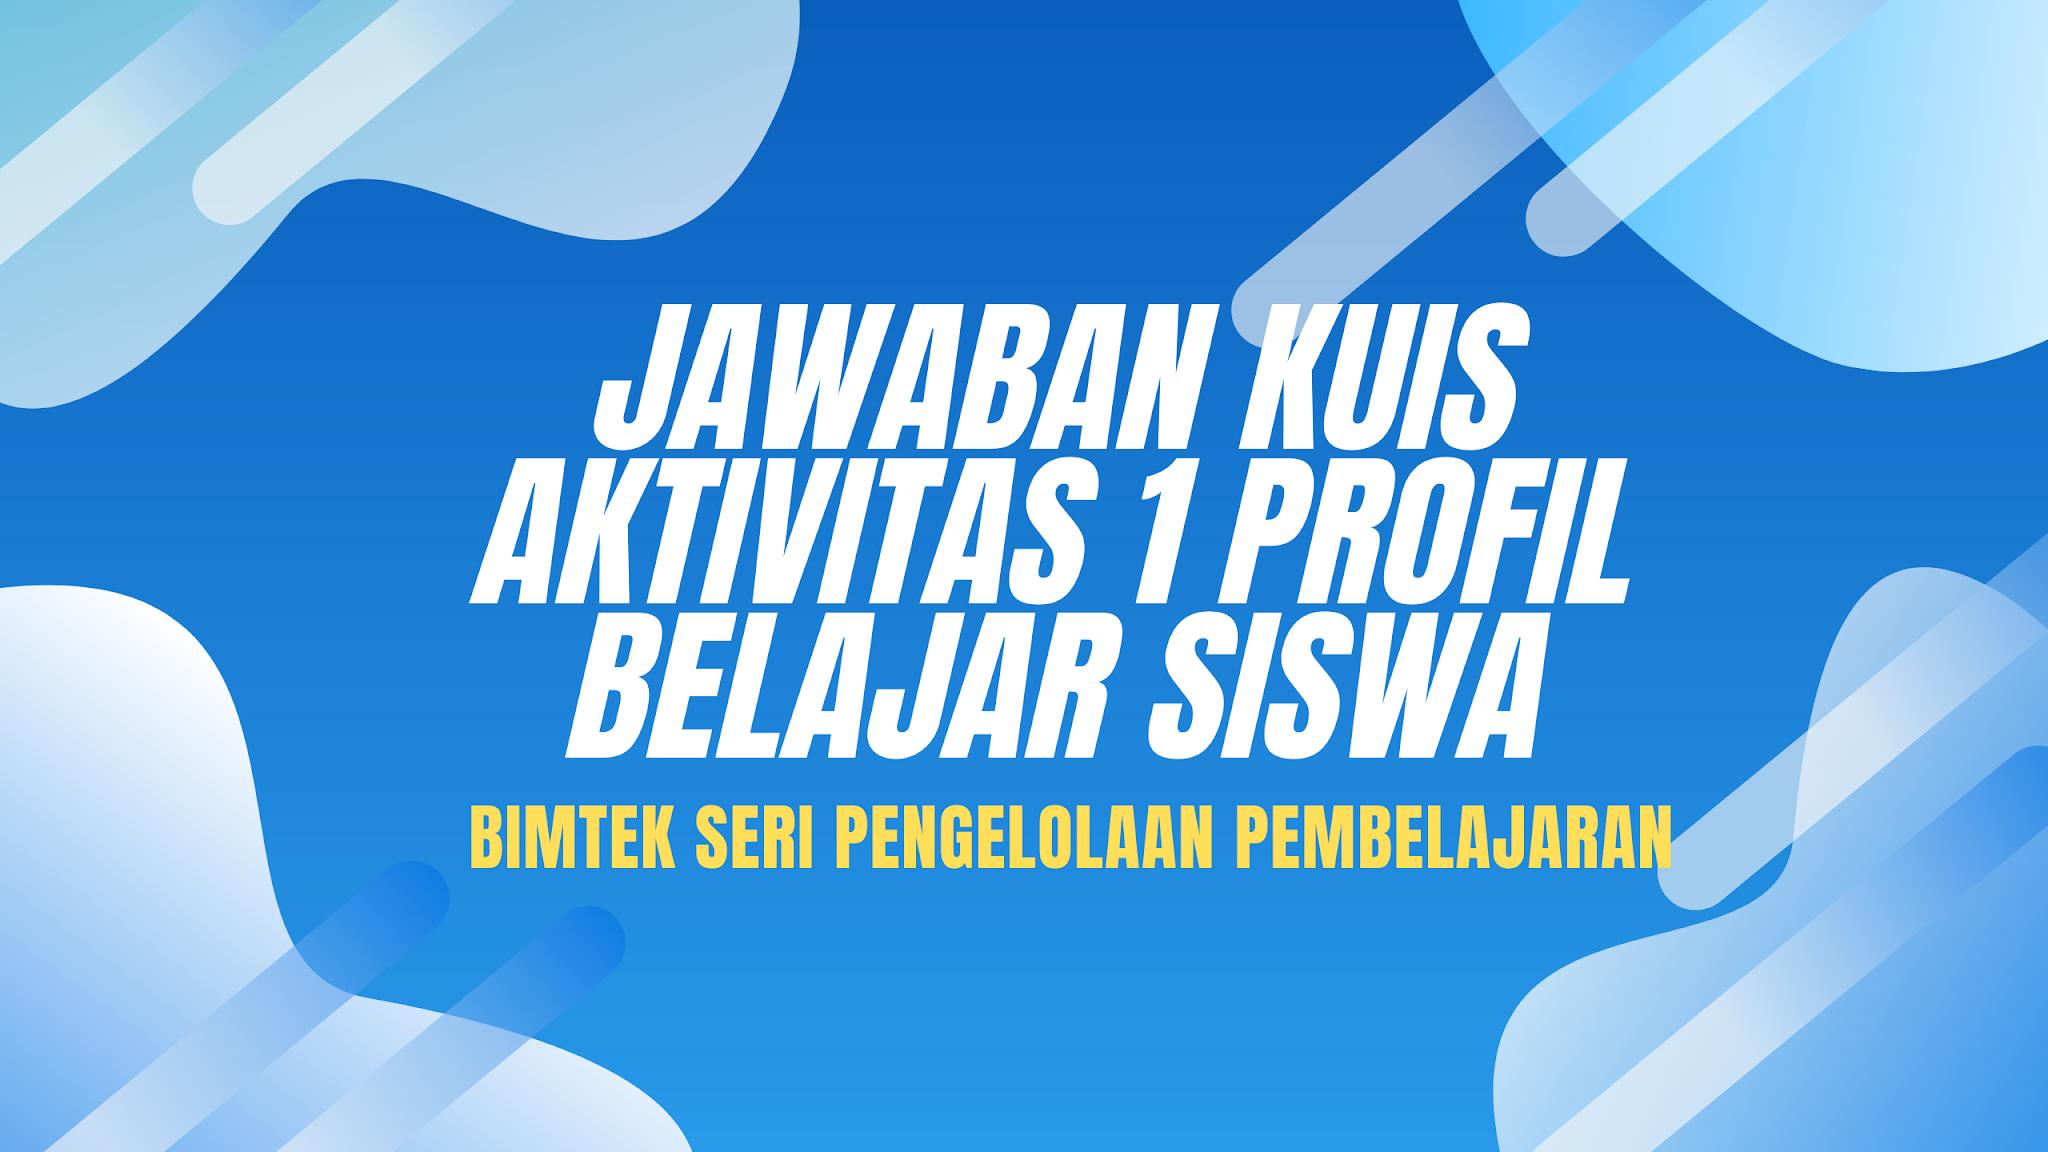 gambar Jawaban Kuis Aktivitas 1 Profil belajar Siswa